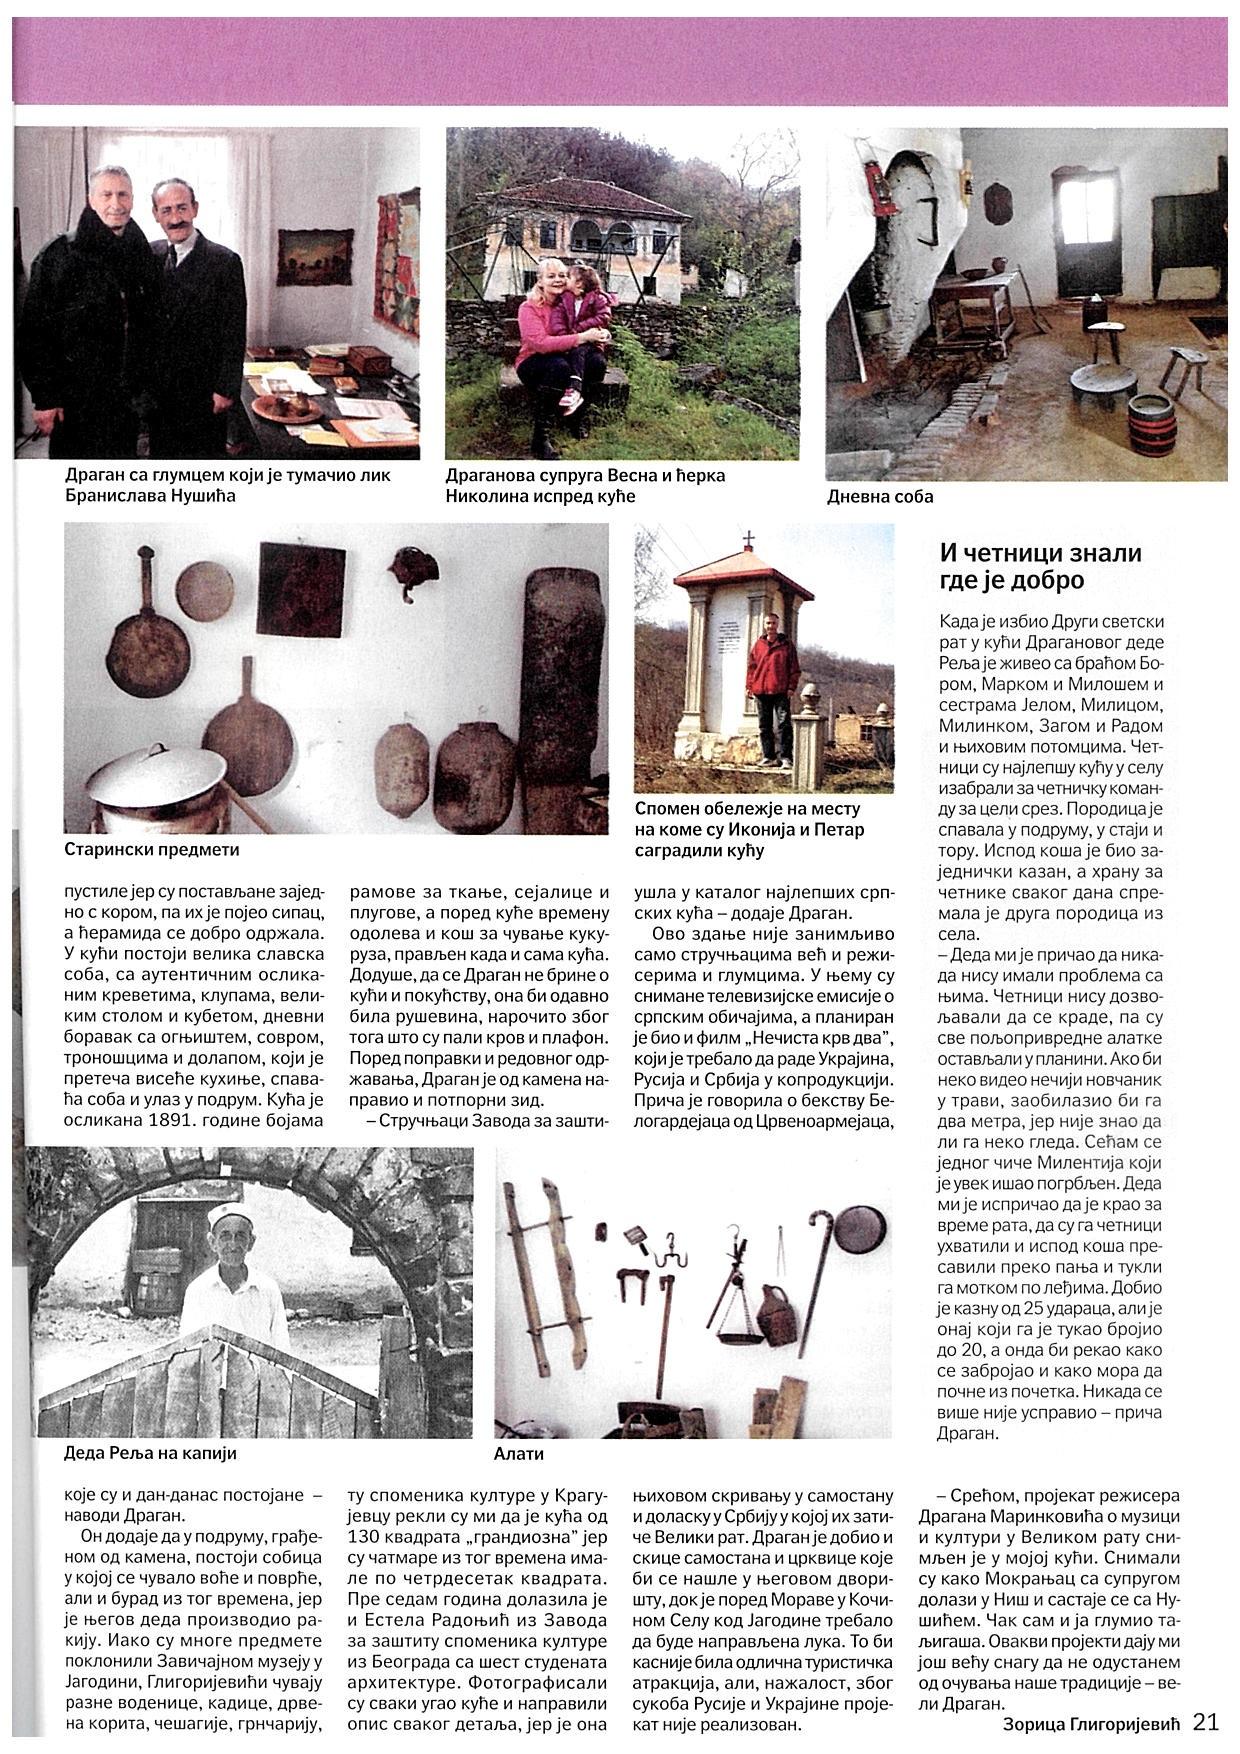 Politikin Magazin - Dome, statki dome 2